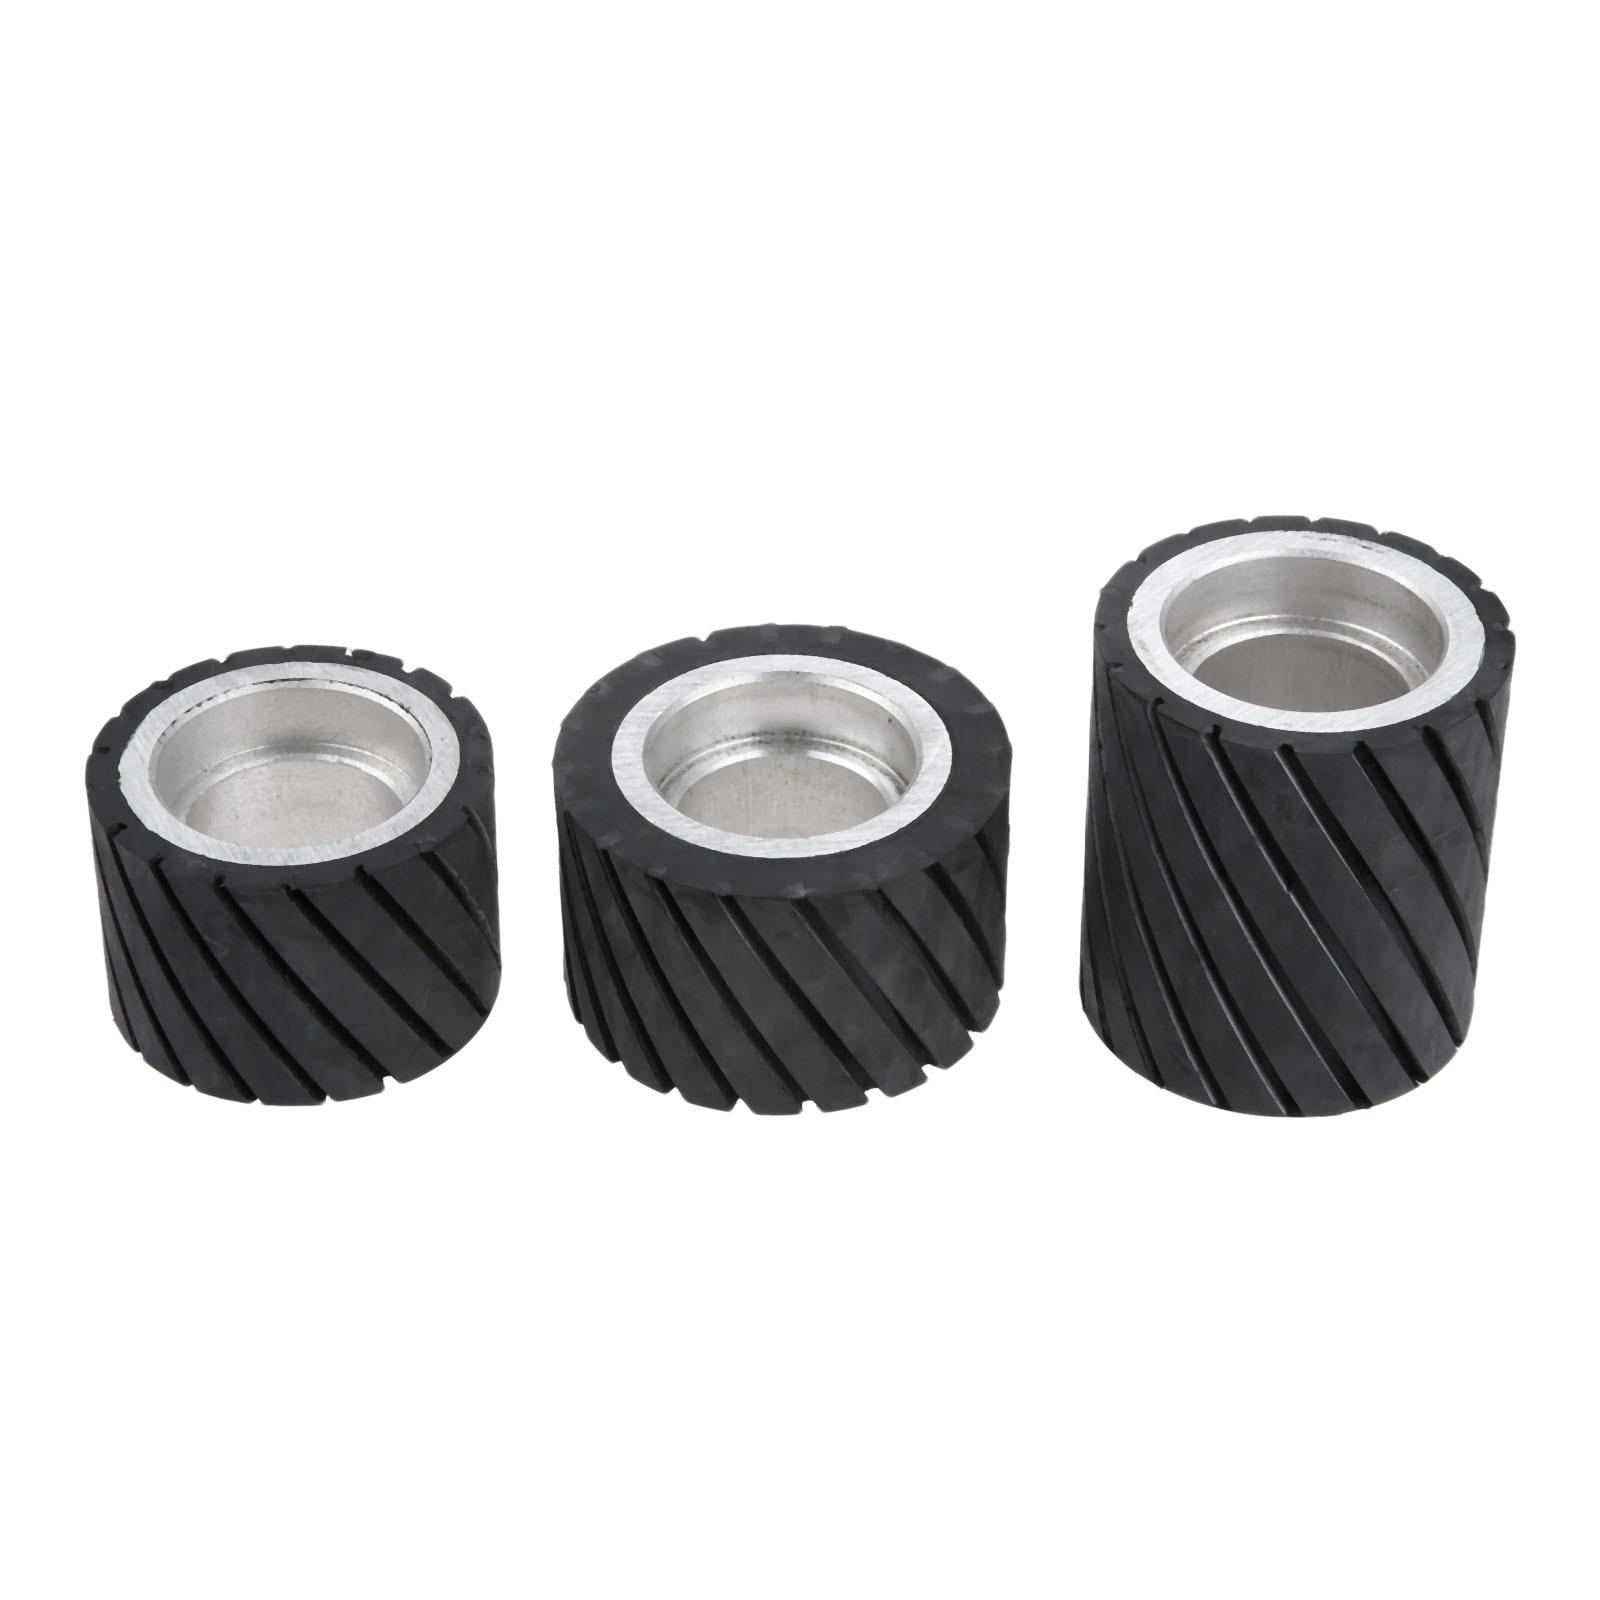 Black Bearings Belt Grinder Rubber Wheel Grinder Accessory 70 x 50mm